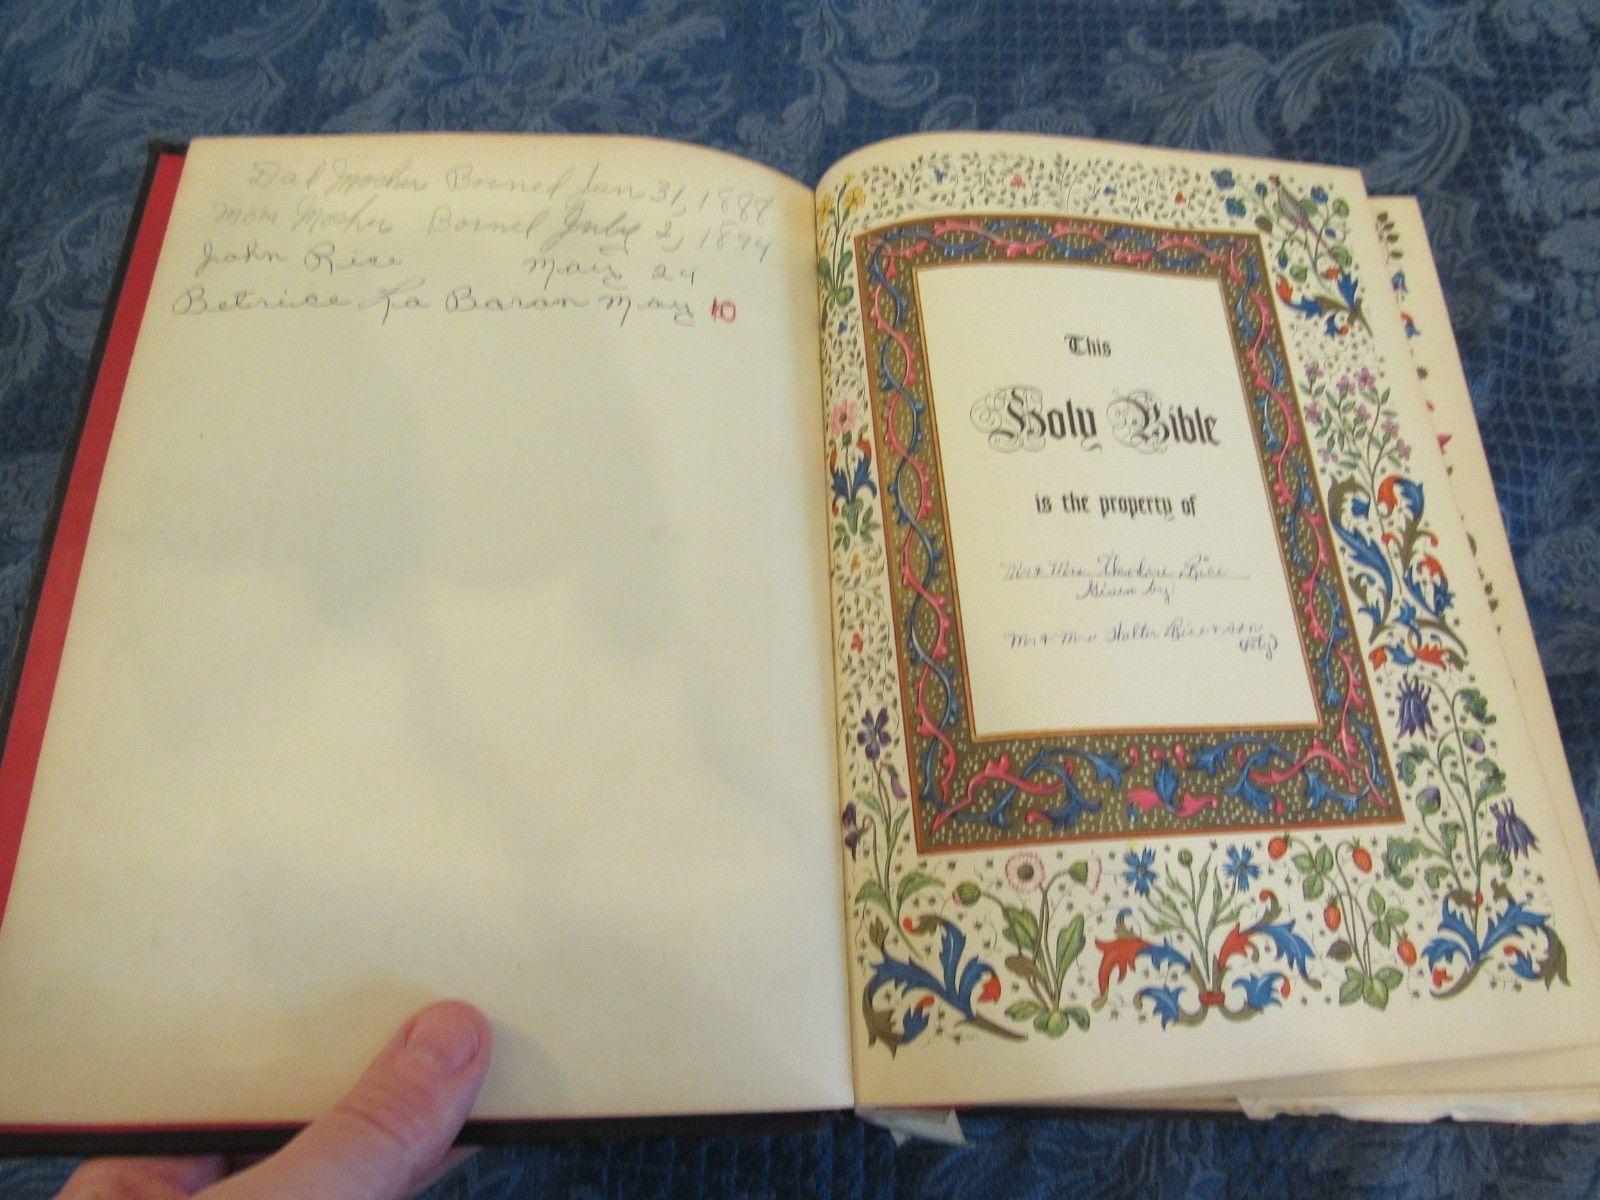 Holy Bible - KJV - Rembrandt Edition Rice Family Gilt Edged